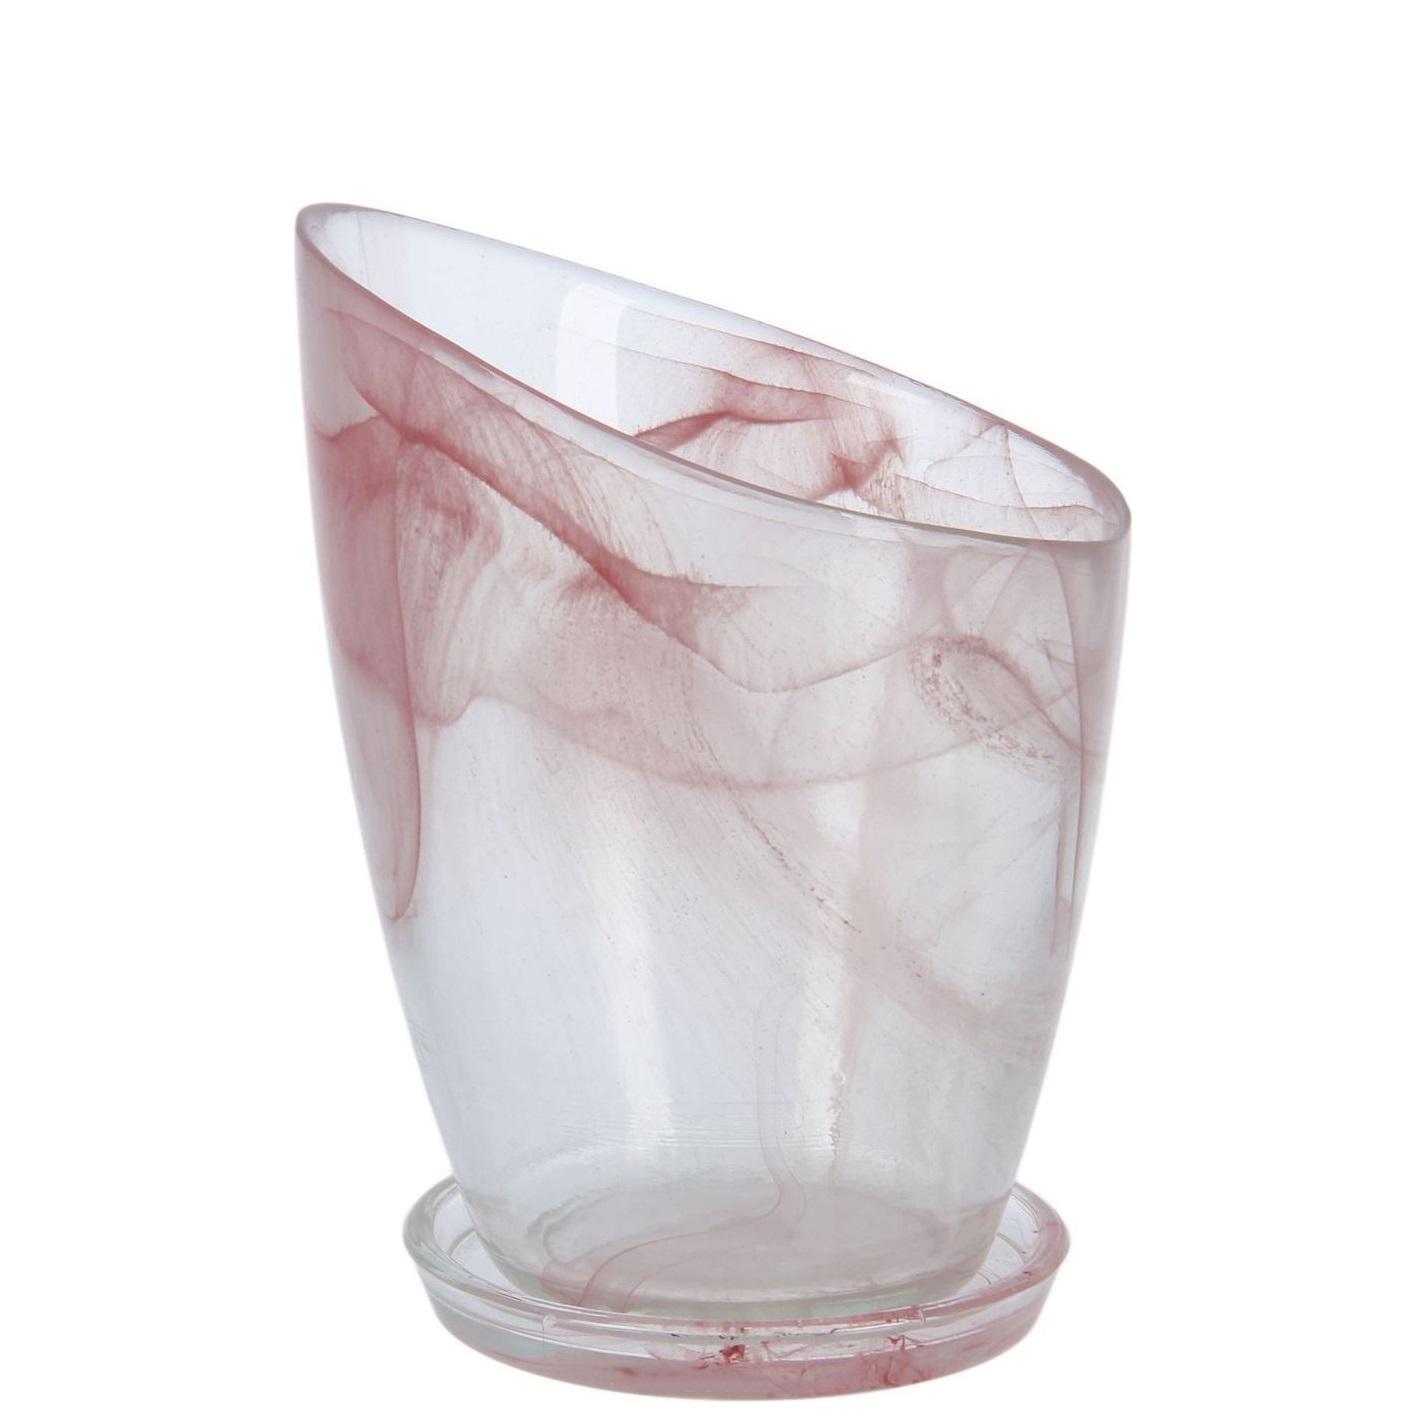 Кашпо Шерон розовое 16,8 (93-056)